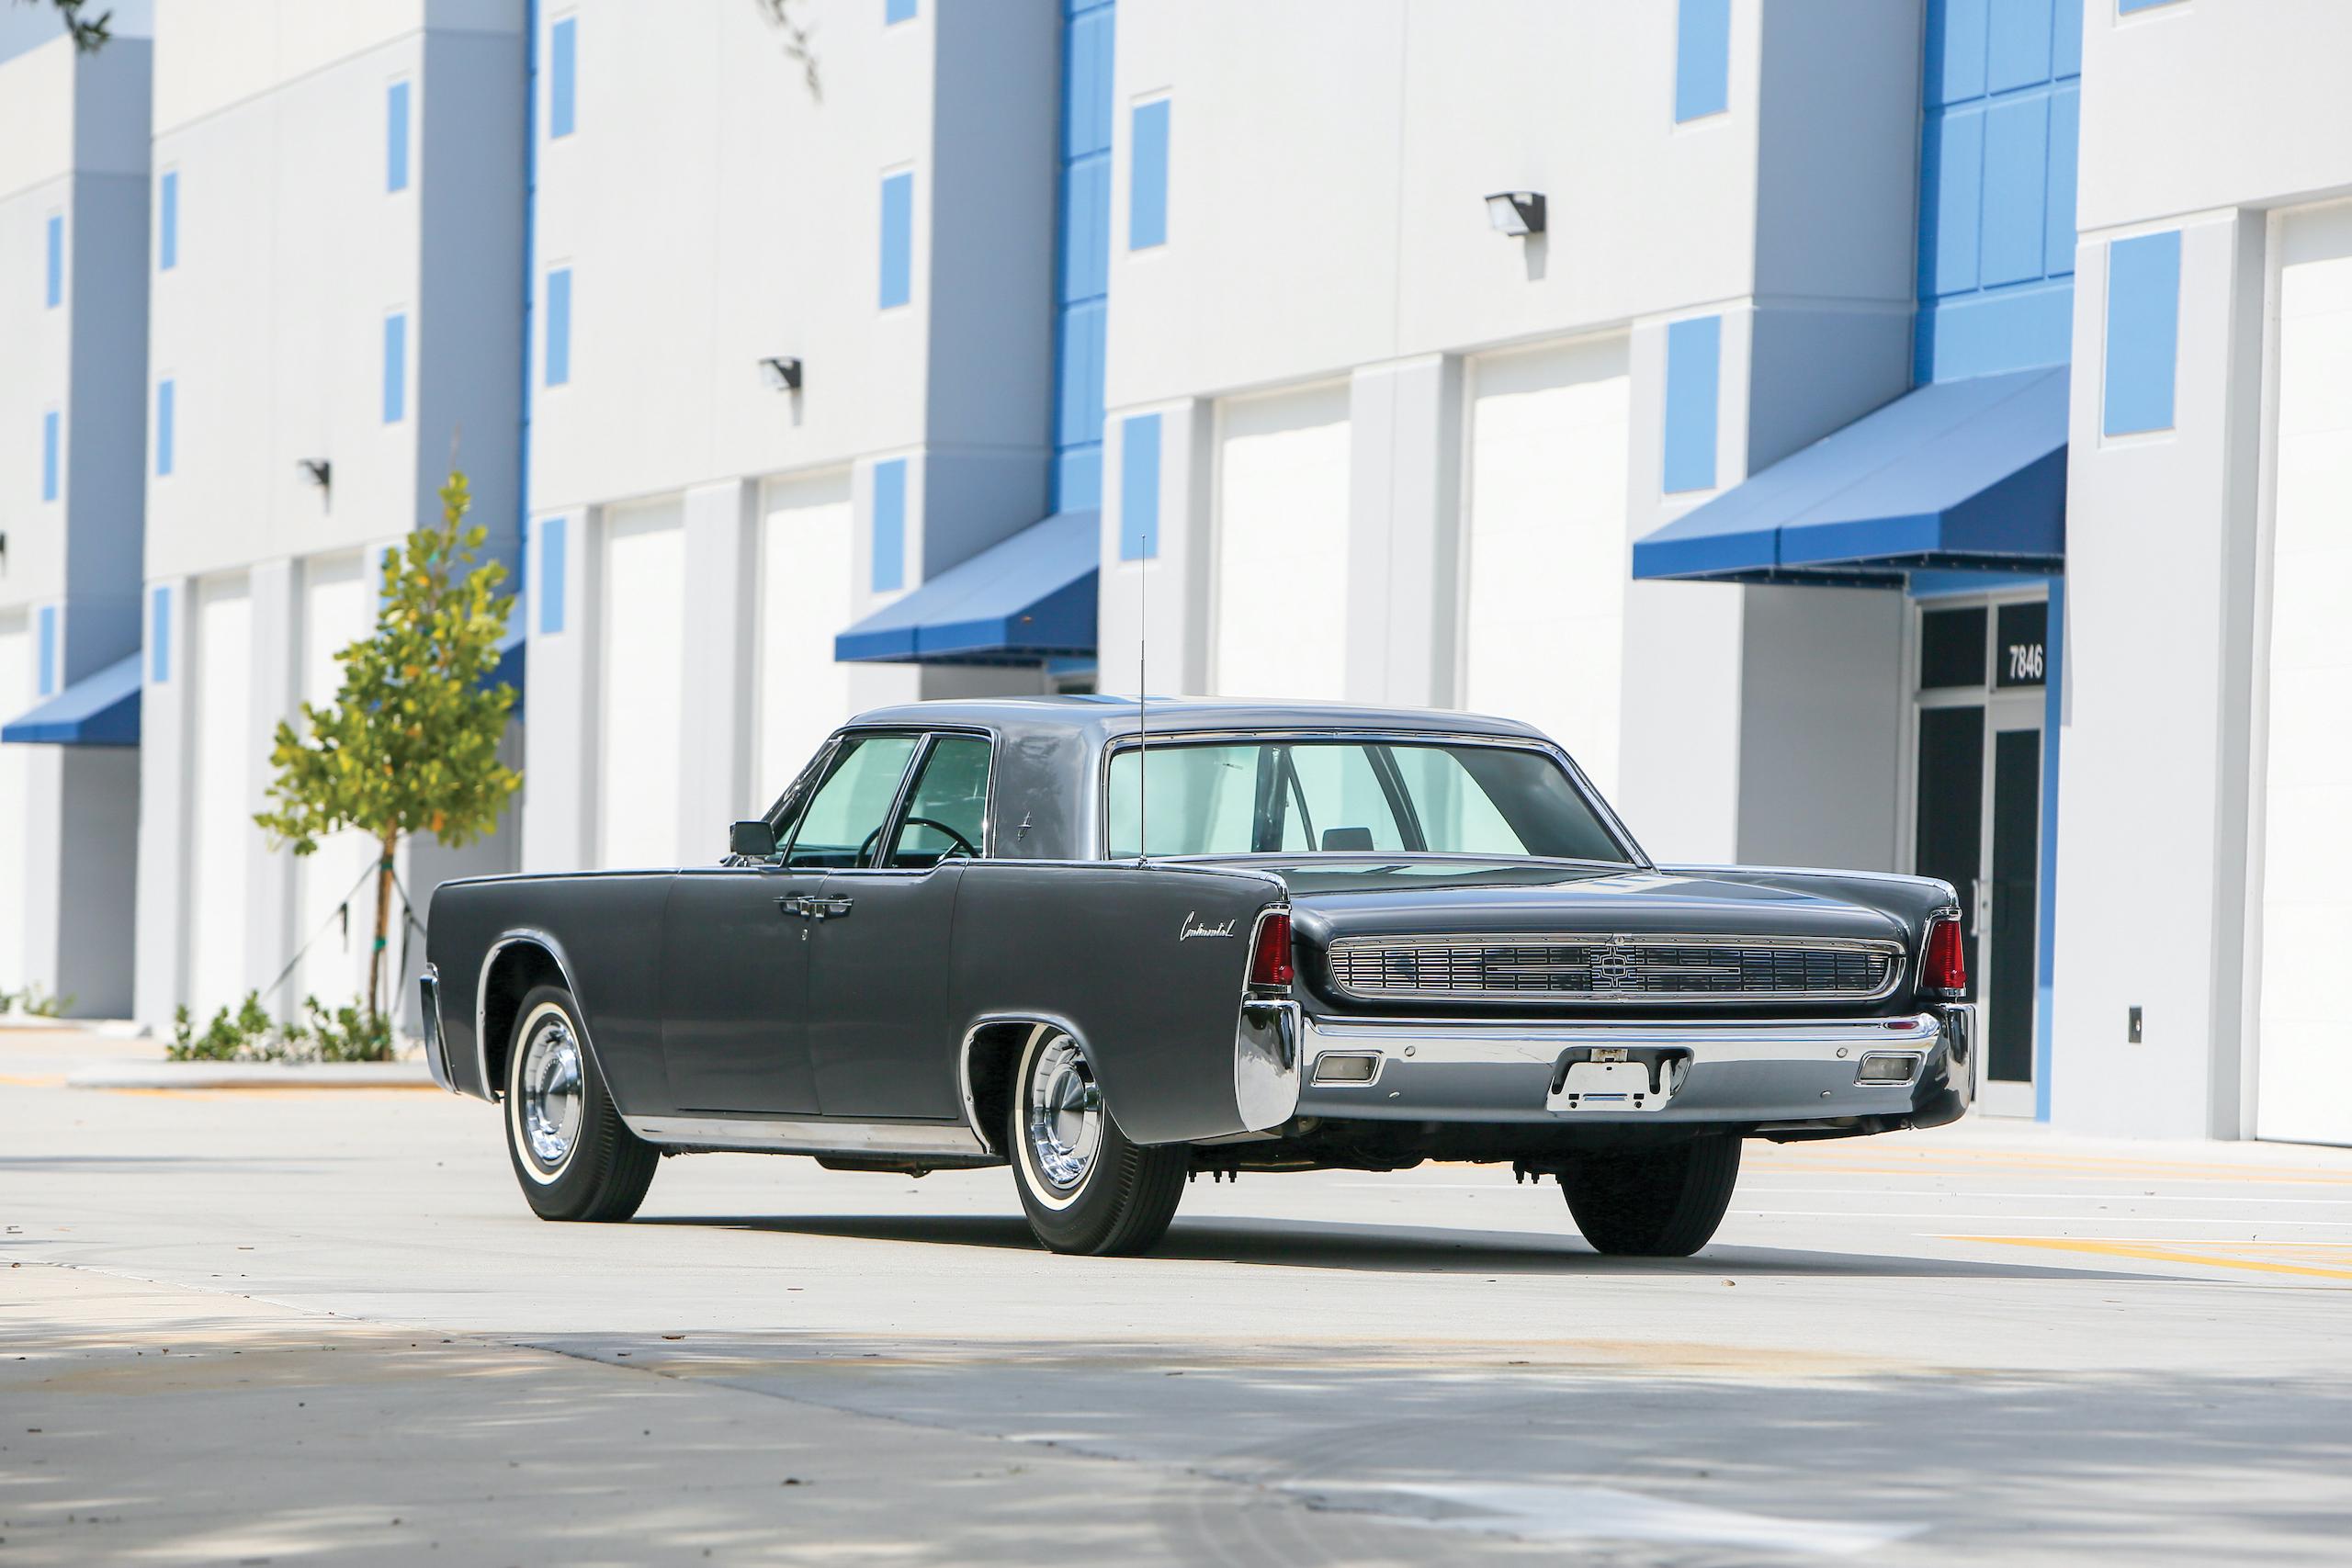 1962 Lincoln Continental rear three-quarter